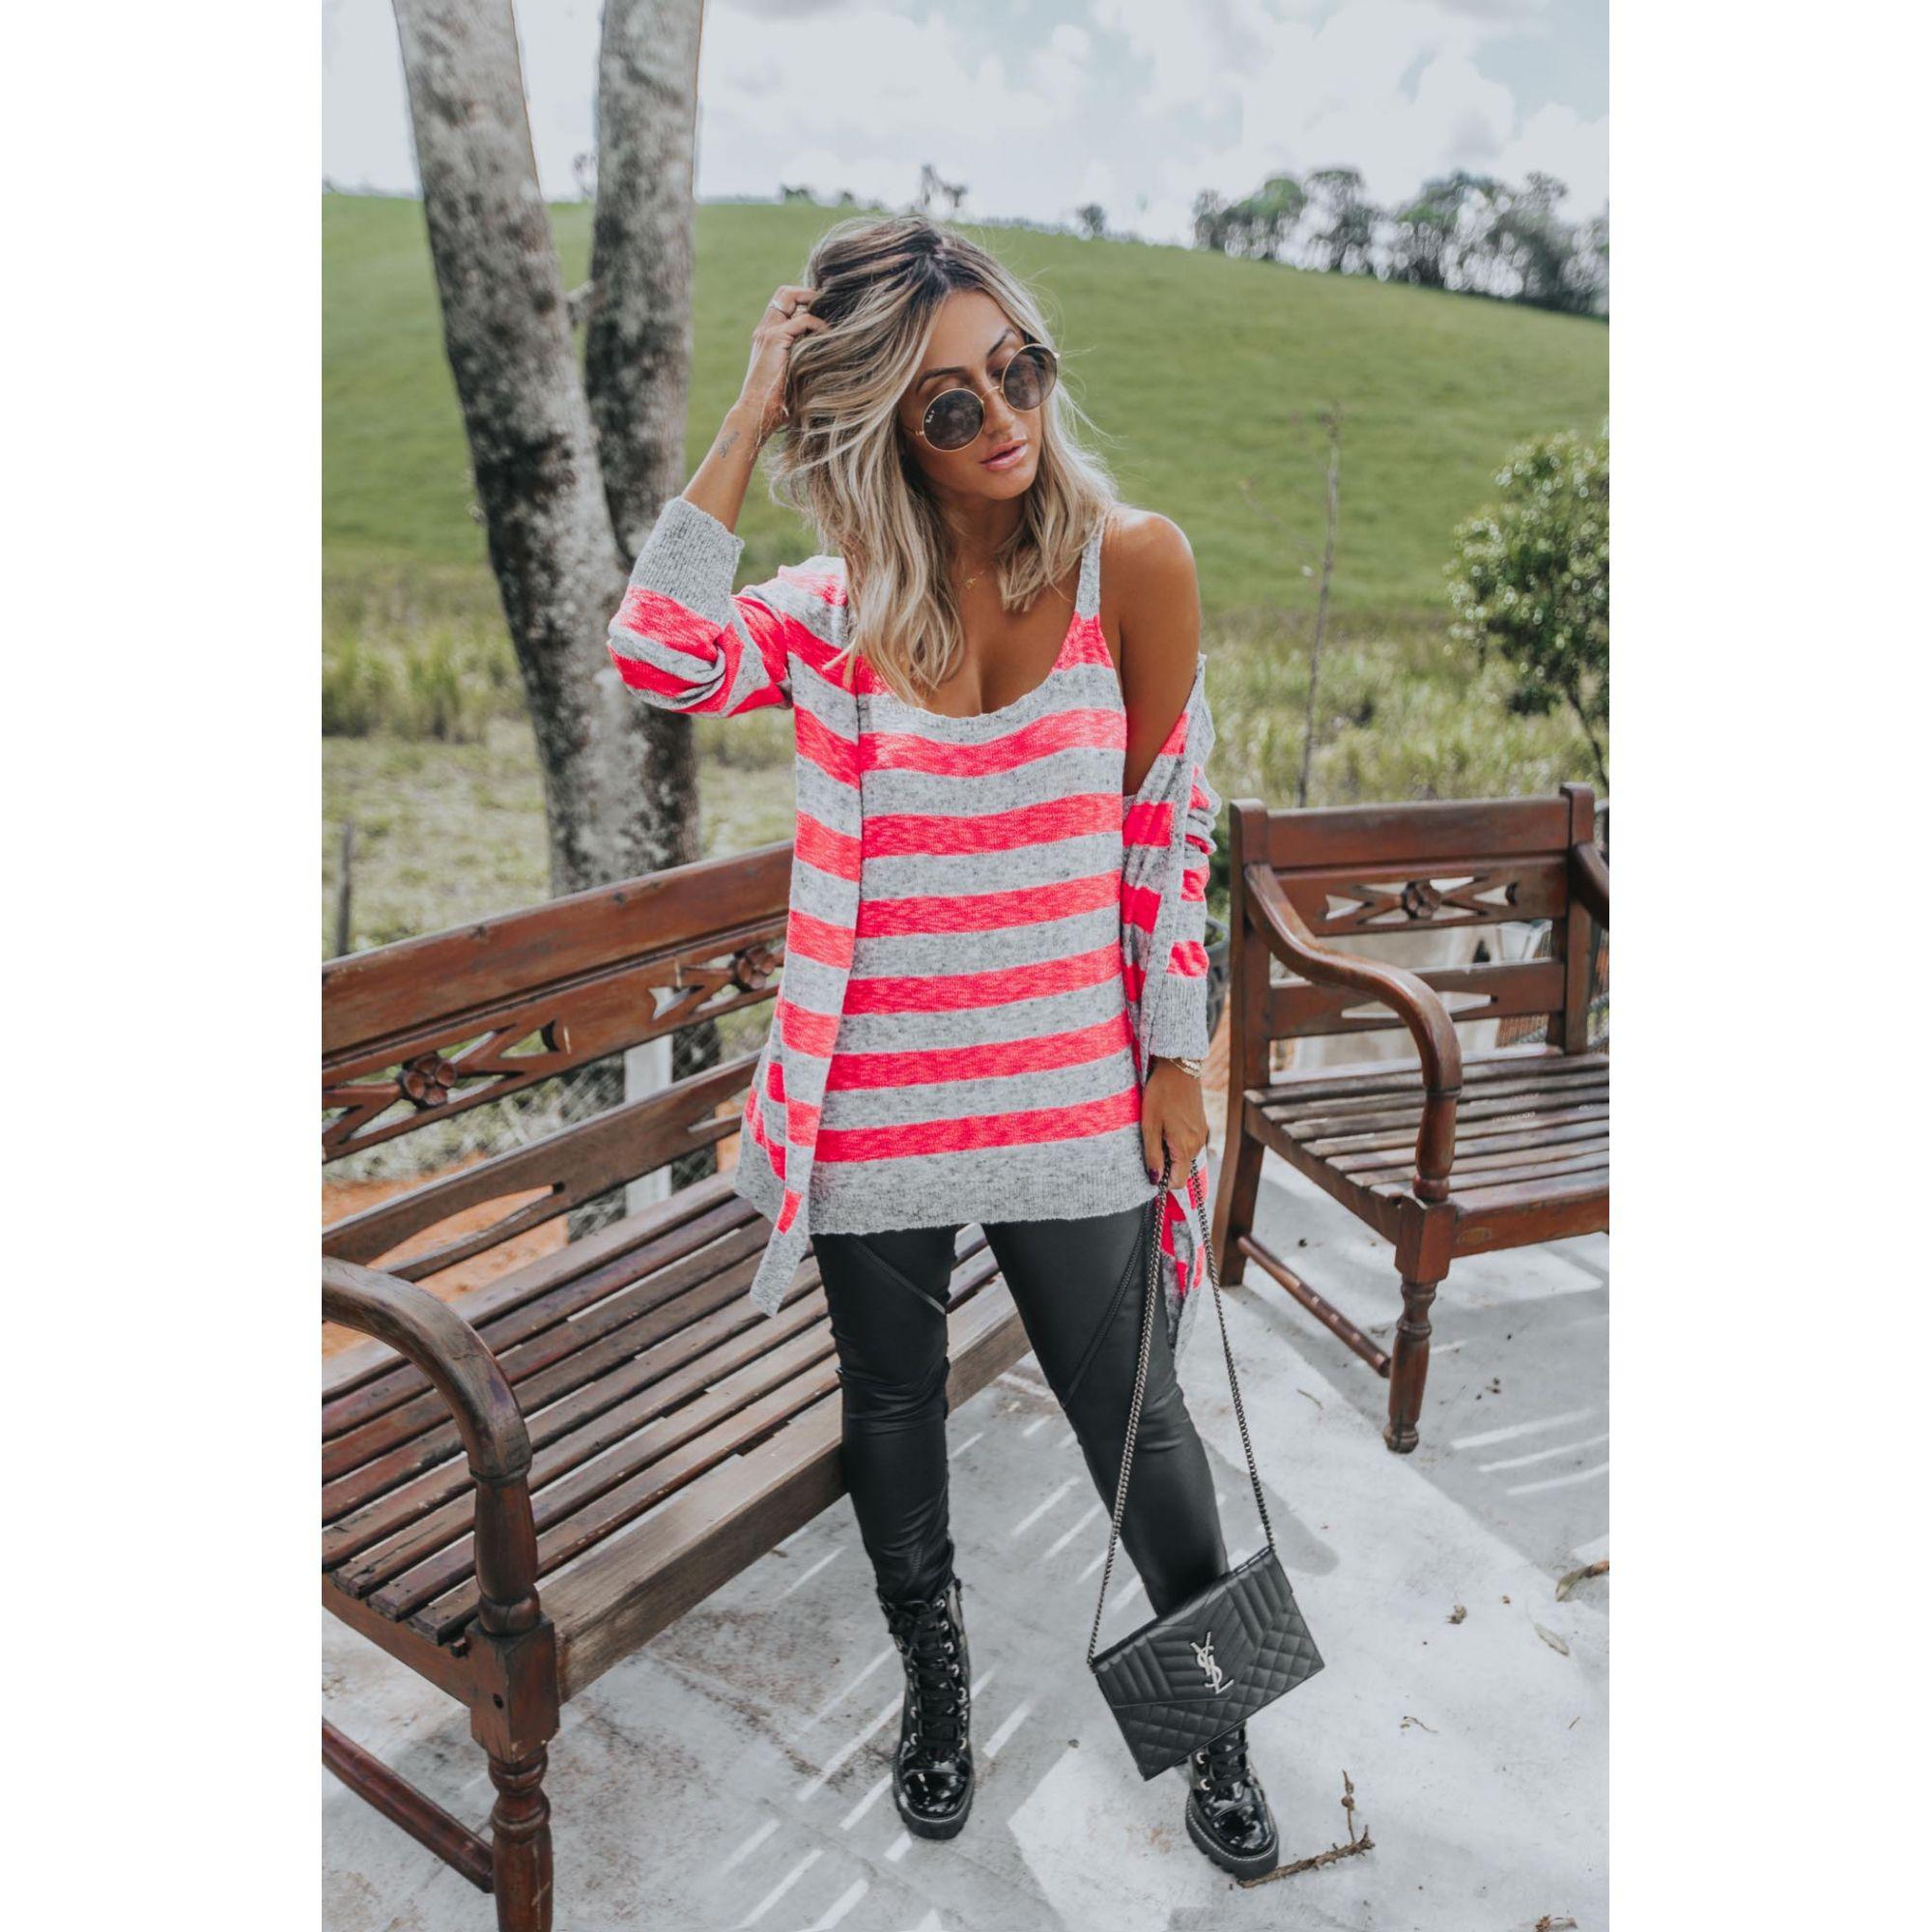 Blusa Regata Listrada Vera Tricot Feminino Pink Neon / Cinza